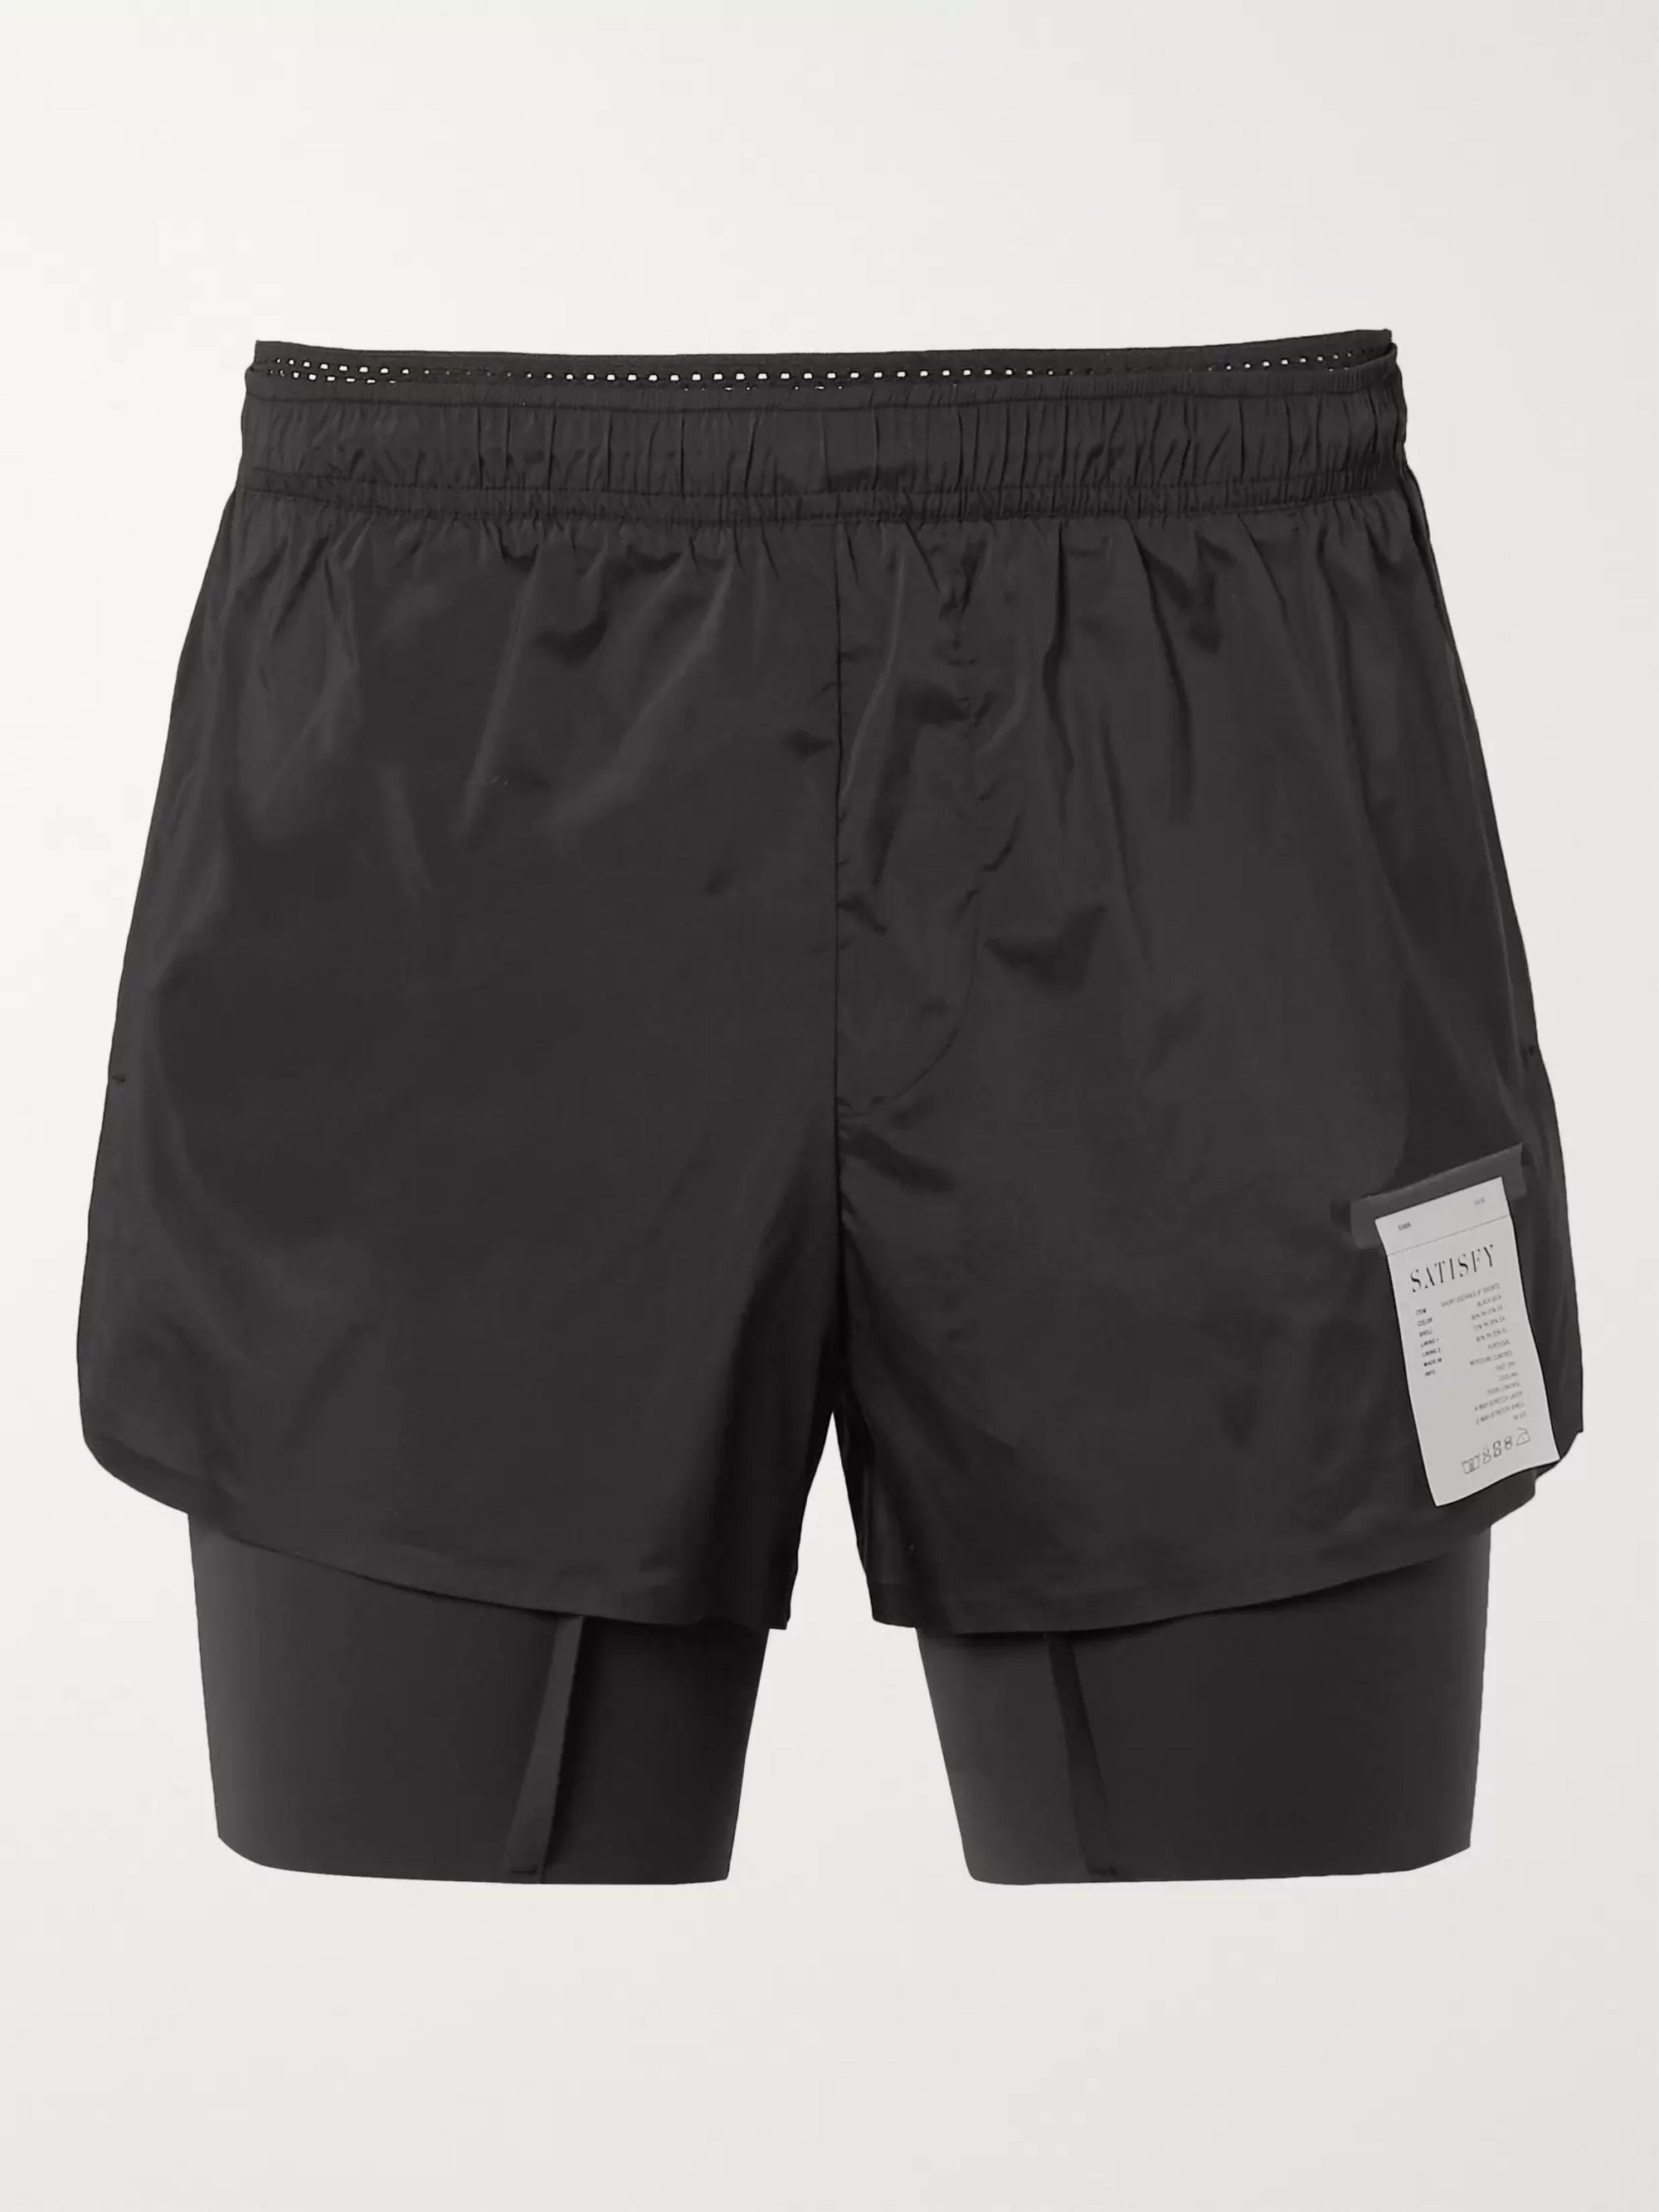 Black Layered Justice and Coldblack Running Shorts | Satisfy | MR PORTER